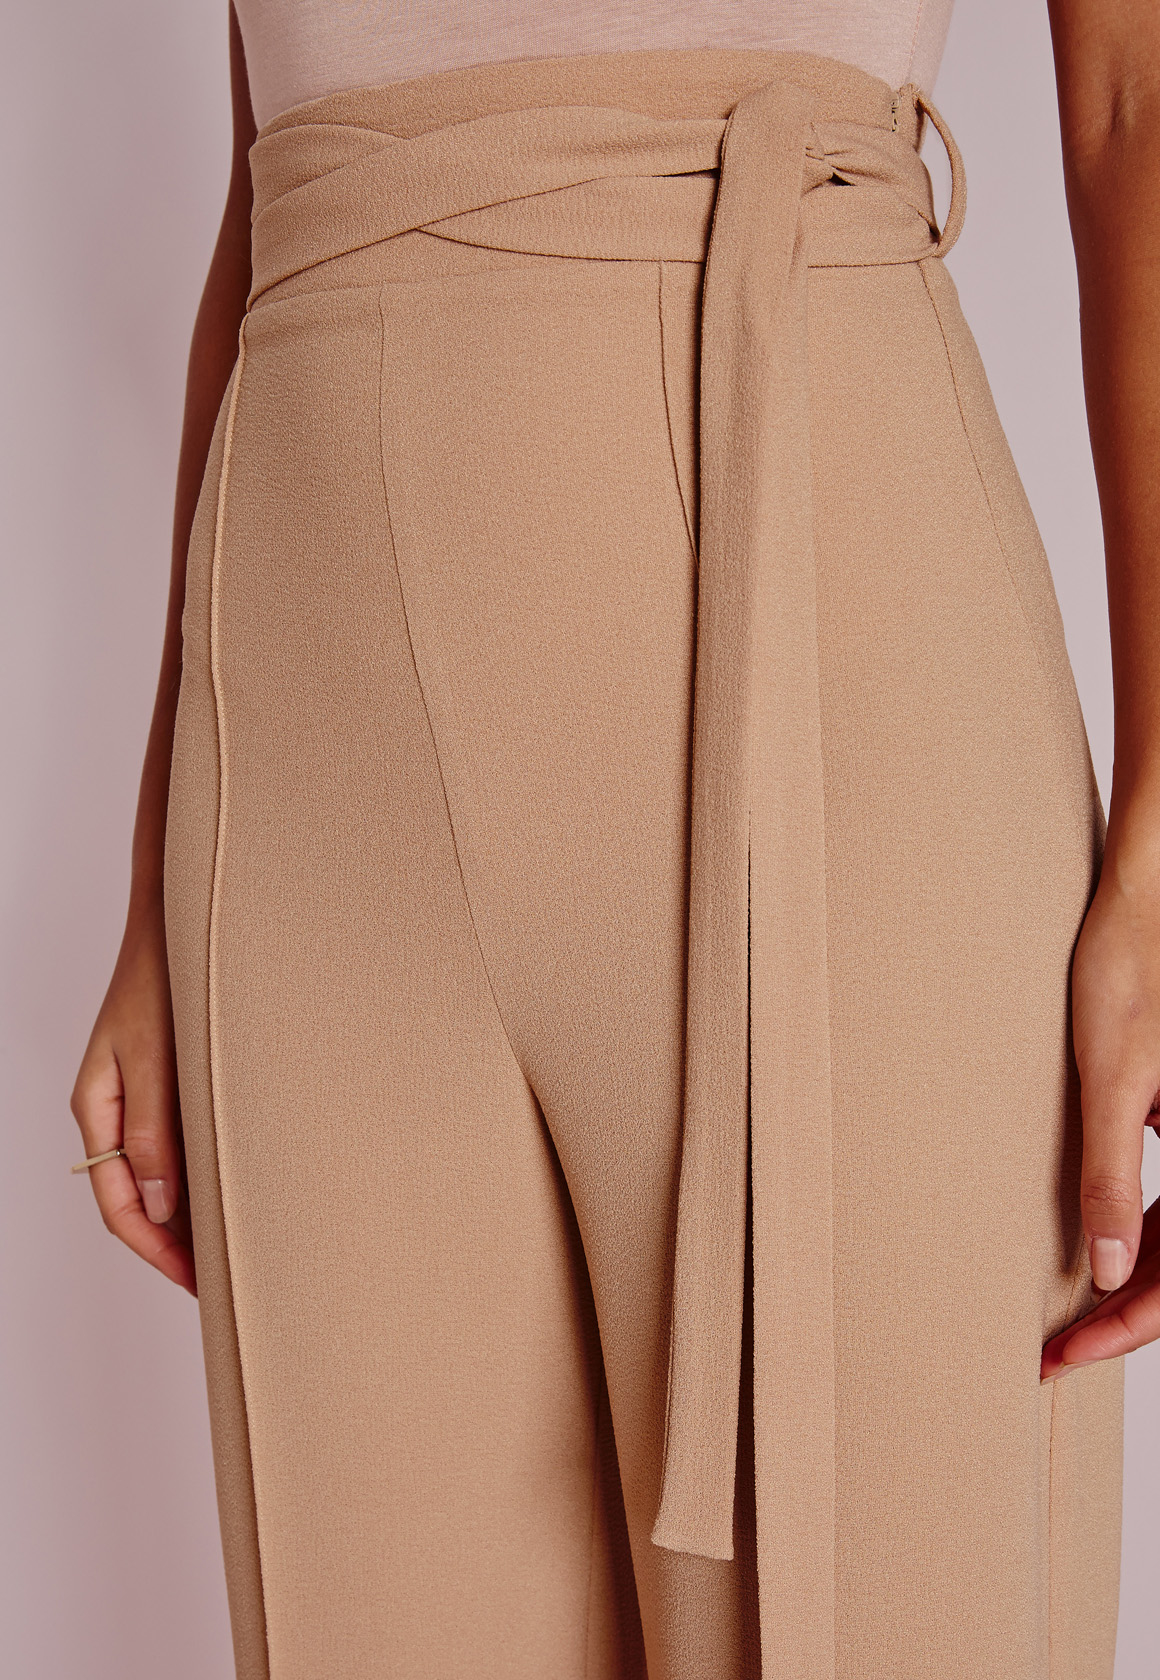 Missguided Petite Tie Waist Crepe Wide Leg Pants Camel In